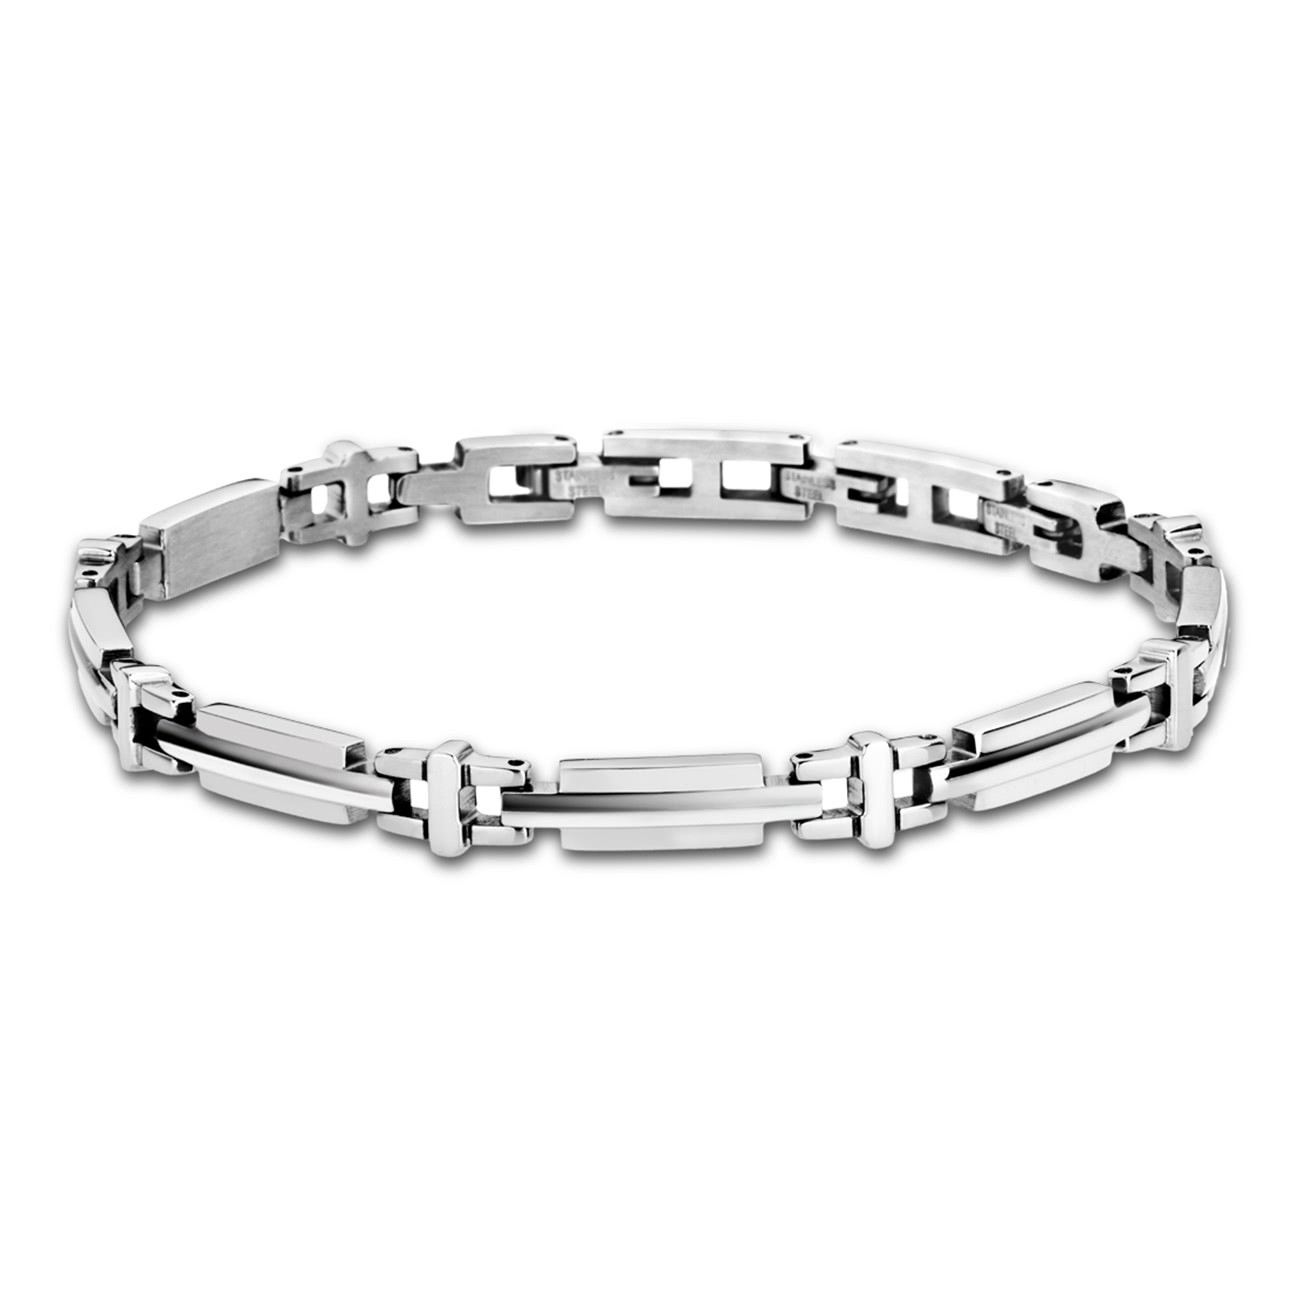 LOTUS Style Armband Herren Edelstahl silber LS1799-2/1 Schmuck JLS1799-2-1